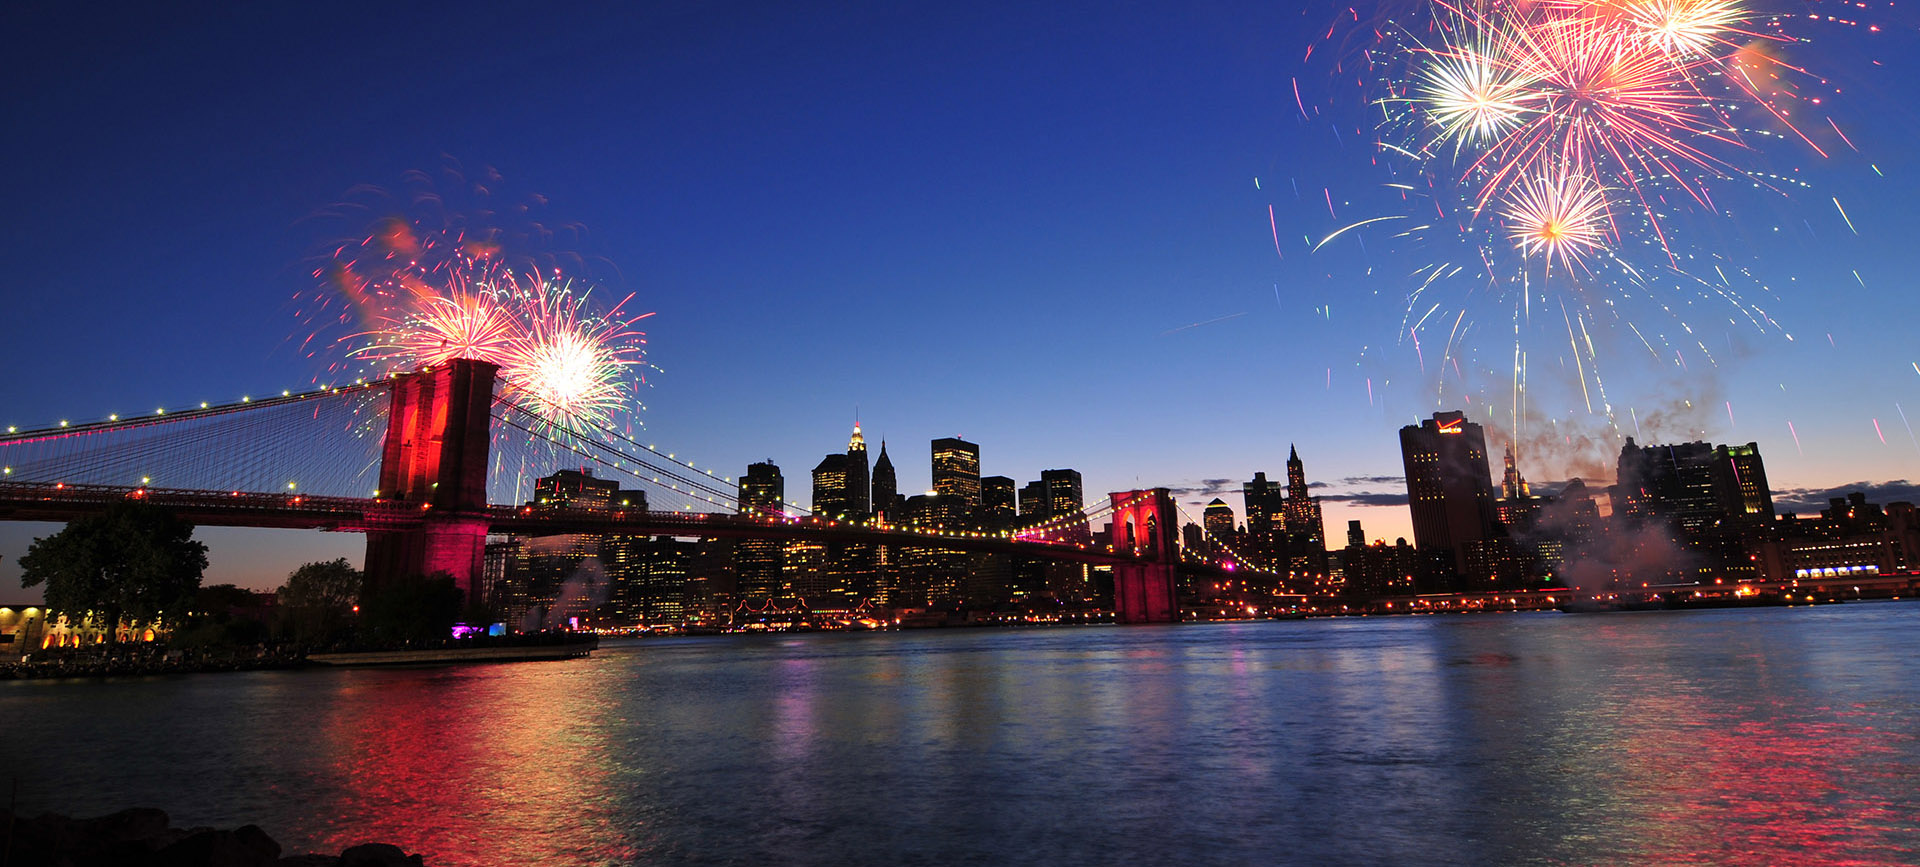 Copy of Brooklyn bridge and Fireworks.